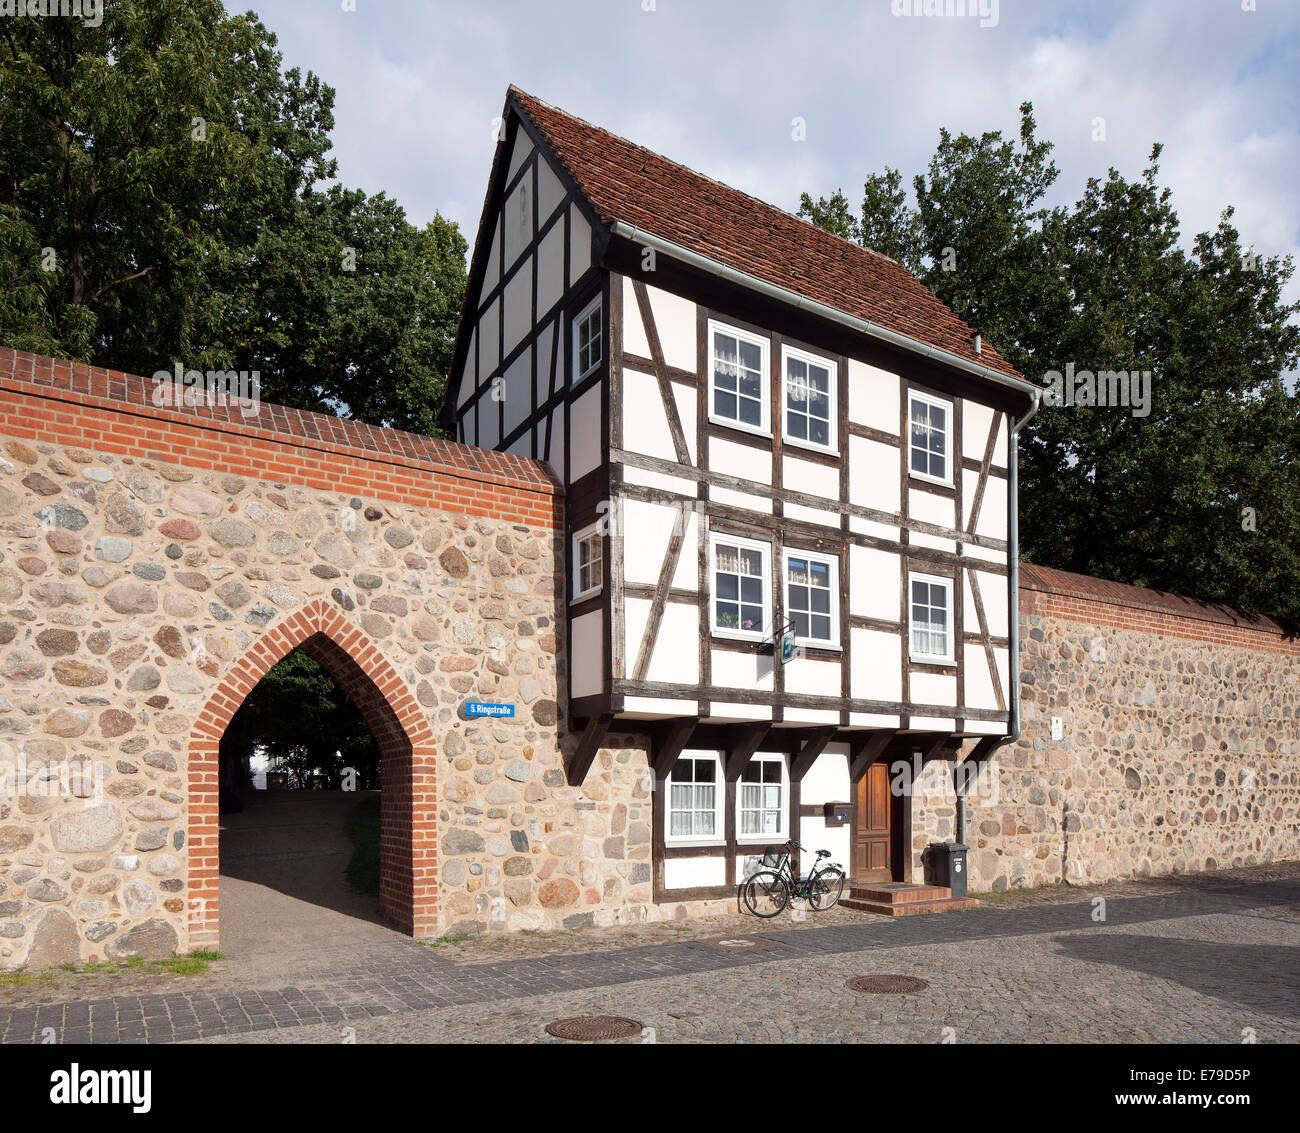 A Wiek House along the medieval city wall, Neubrandenburg, Mecklenburg-Western Pomerania, Germany - Stock Image